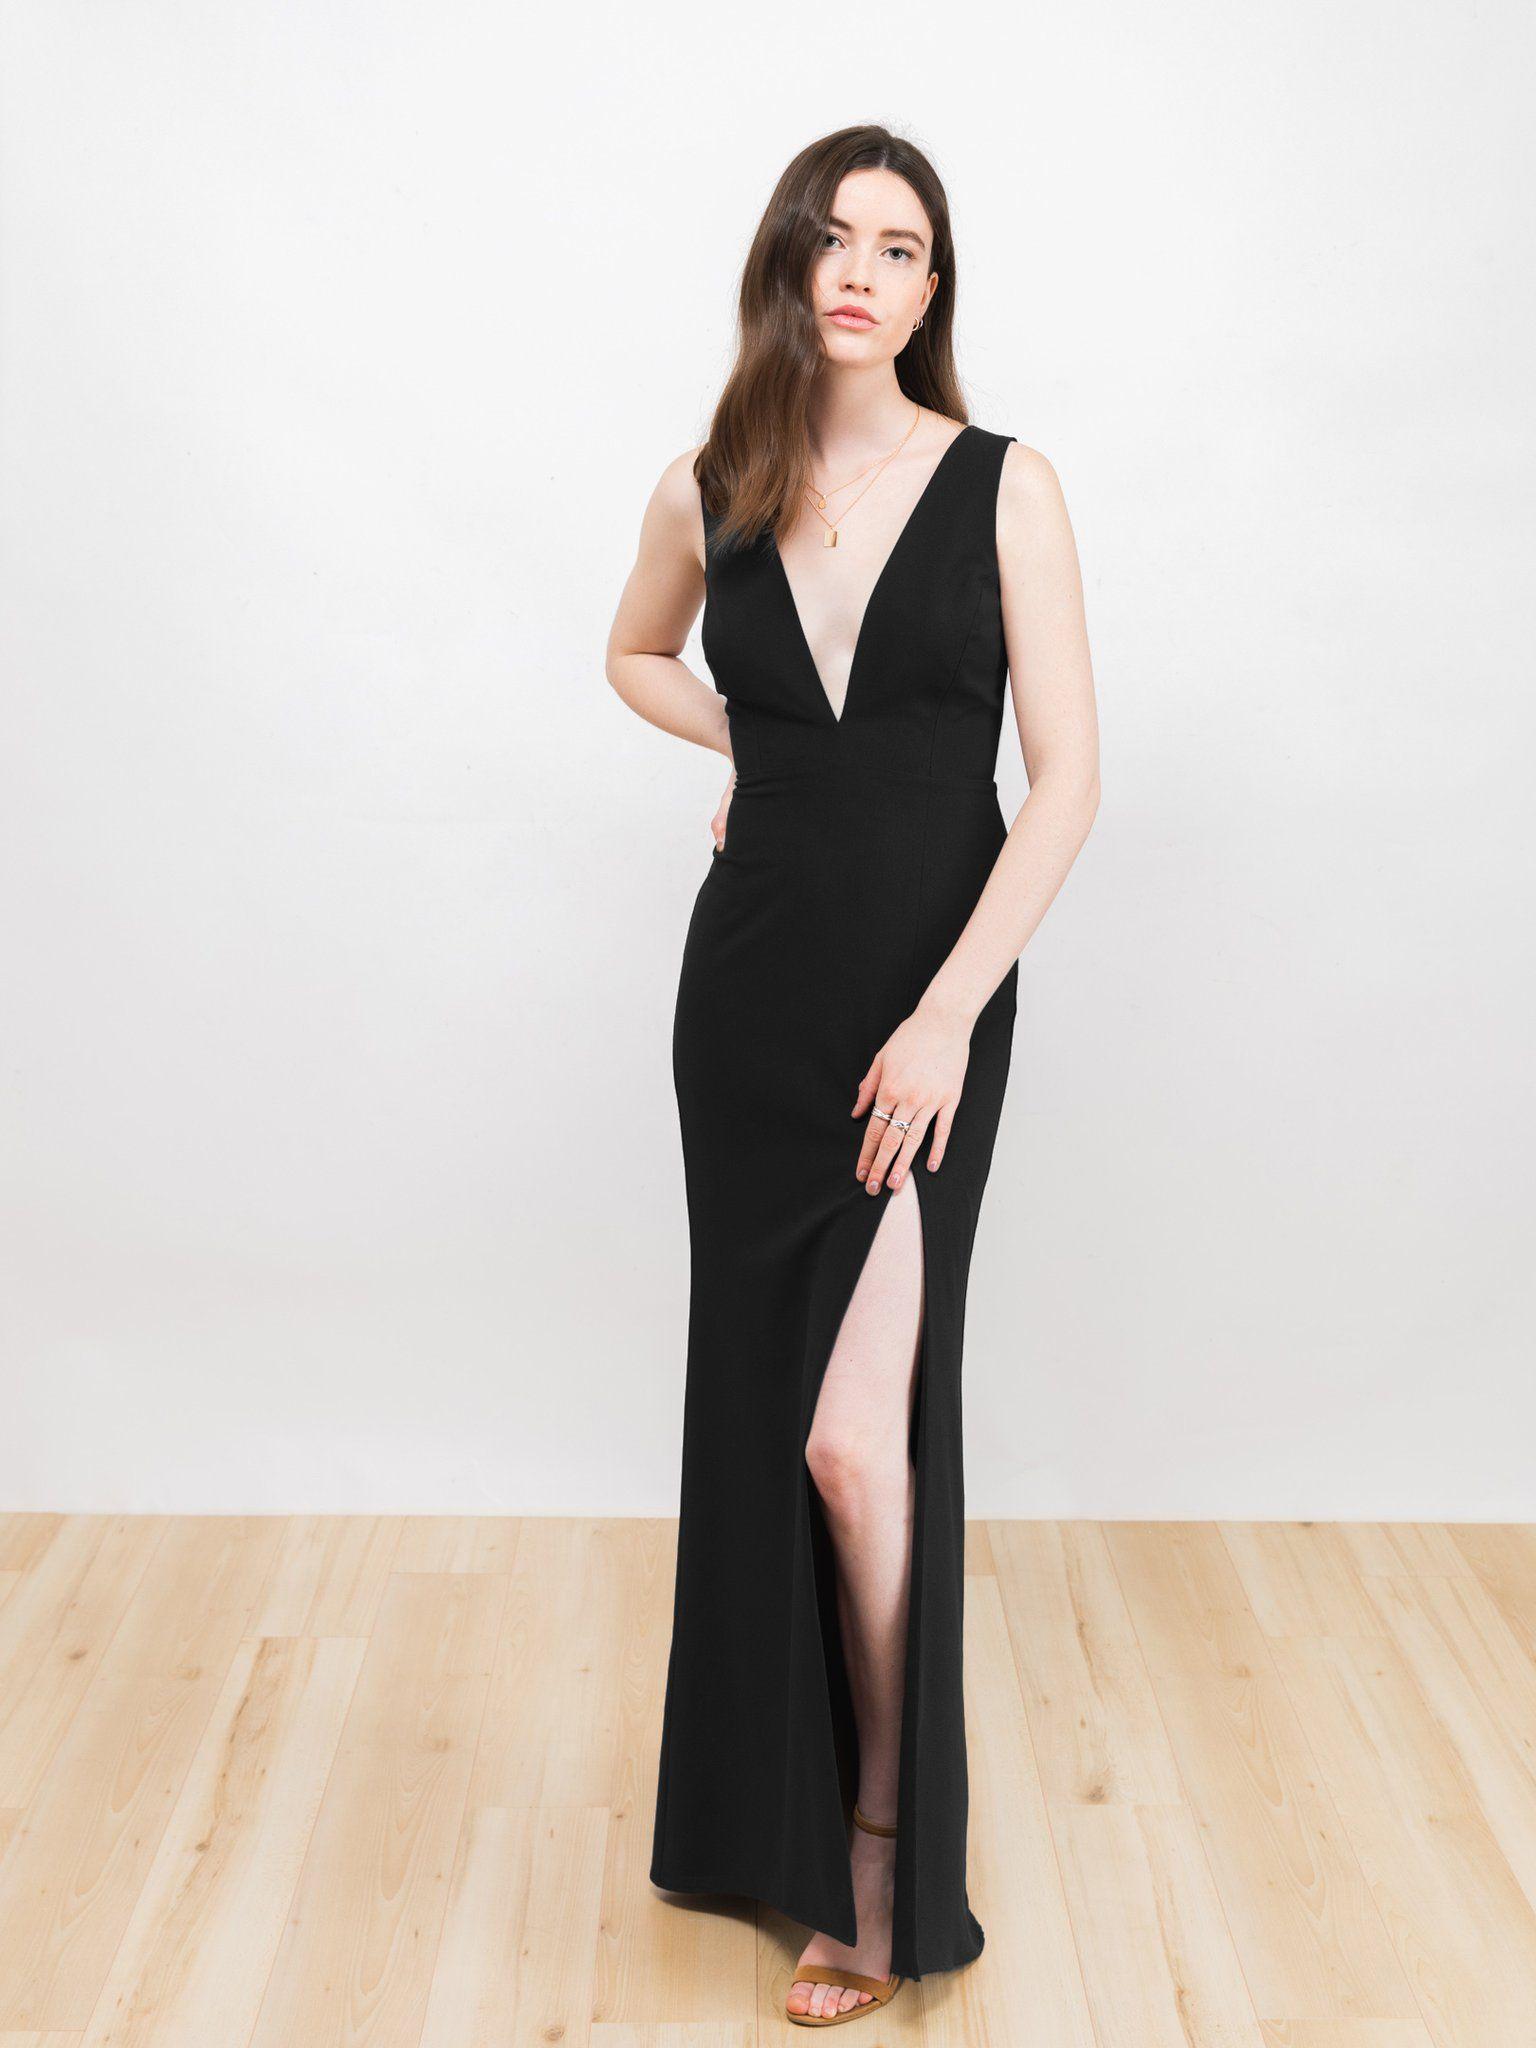 Lexington Dress Dresses, Fashion beauty, Fashion